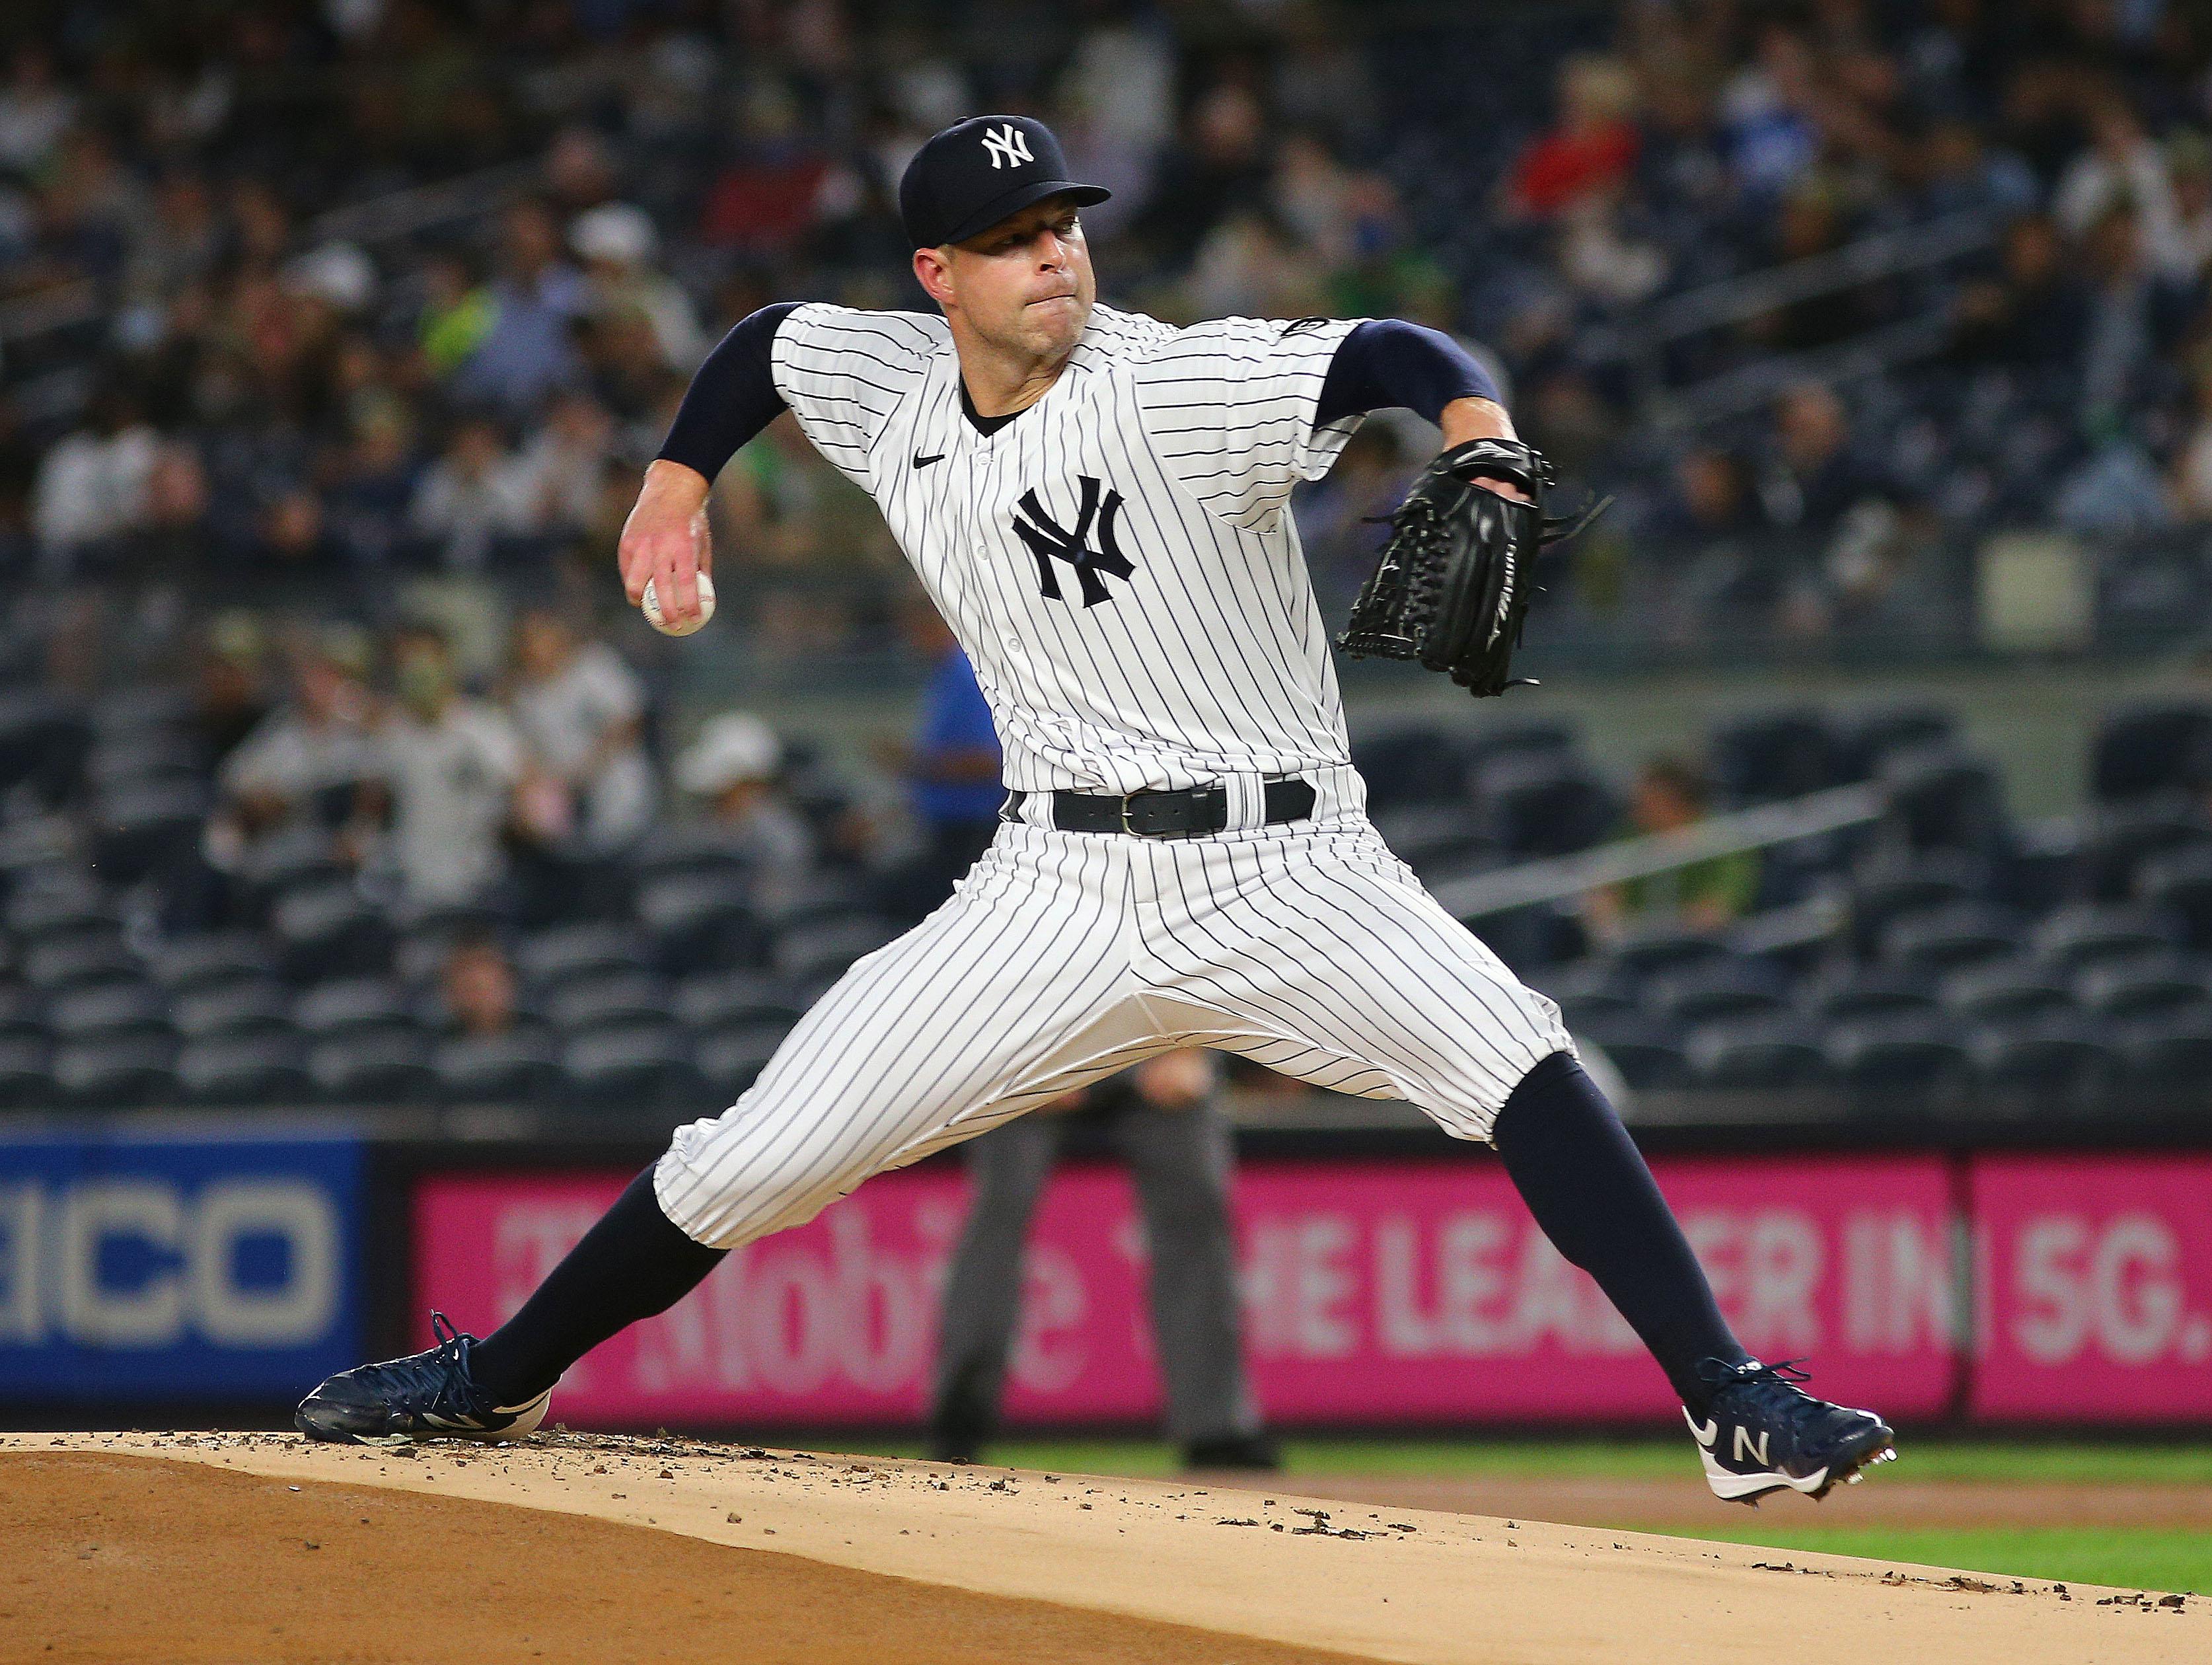 MLB: Cleveland Indians at New York Yankees